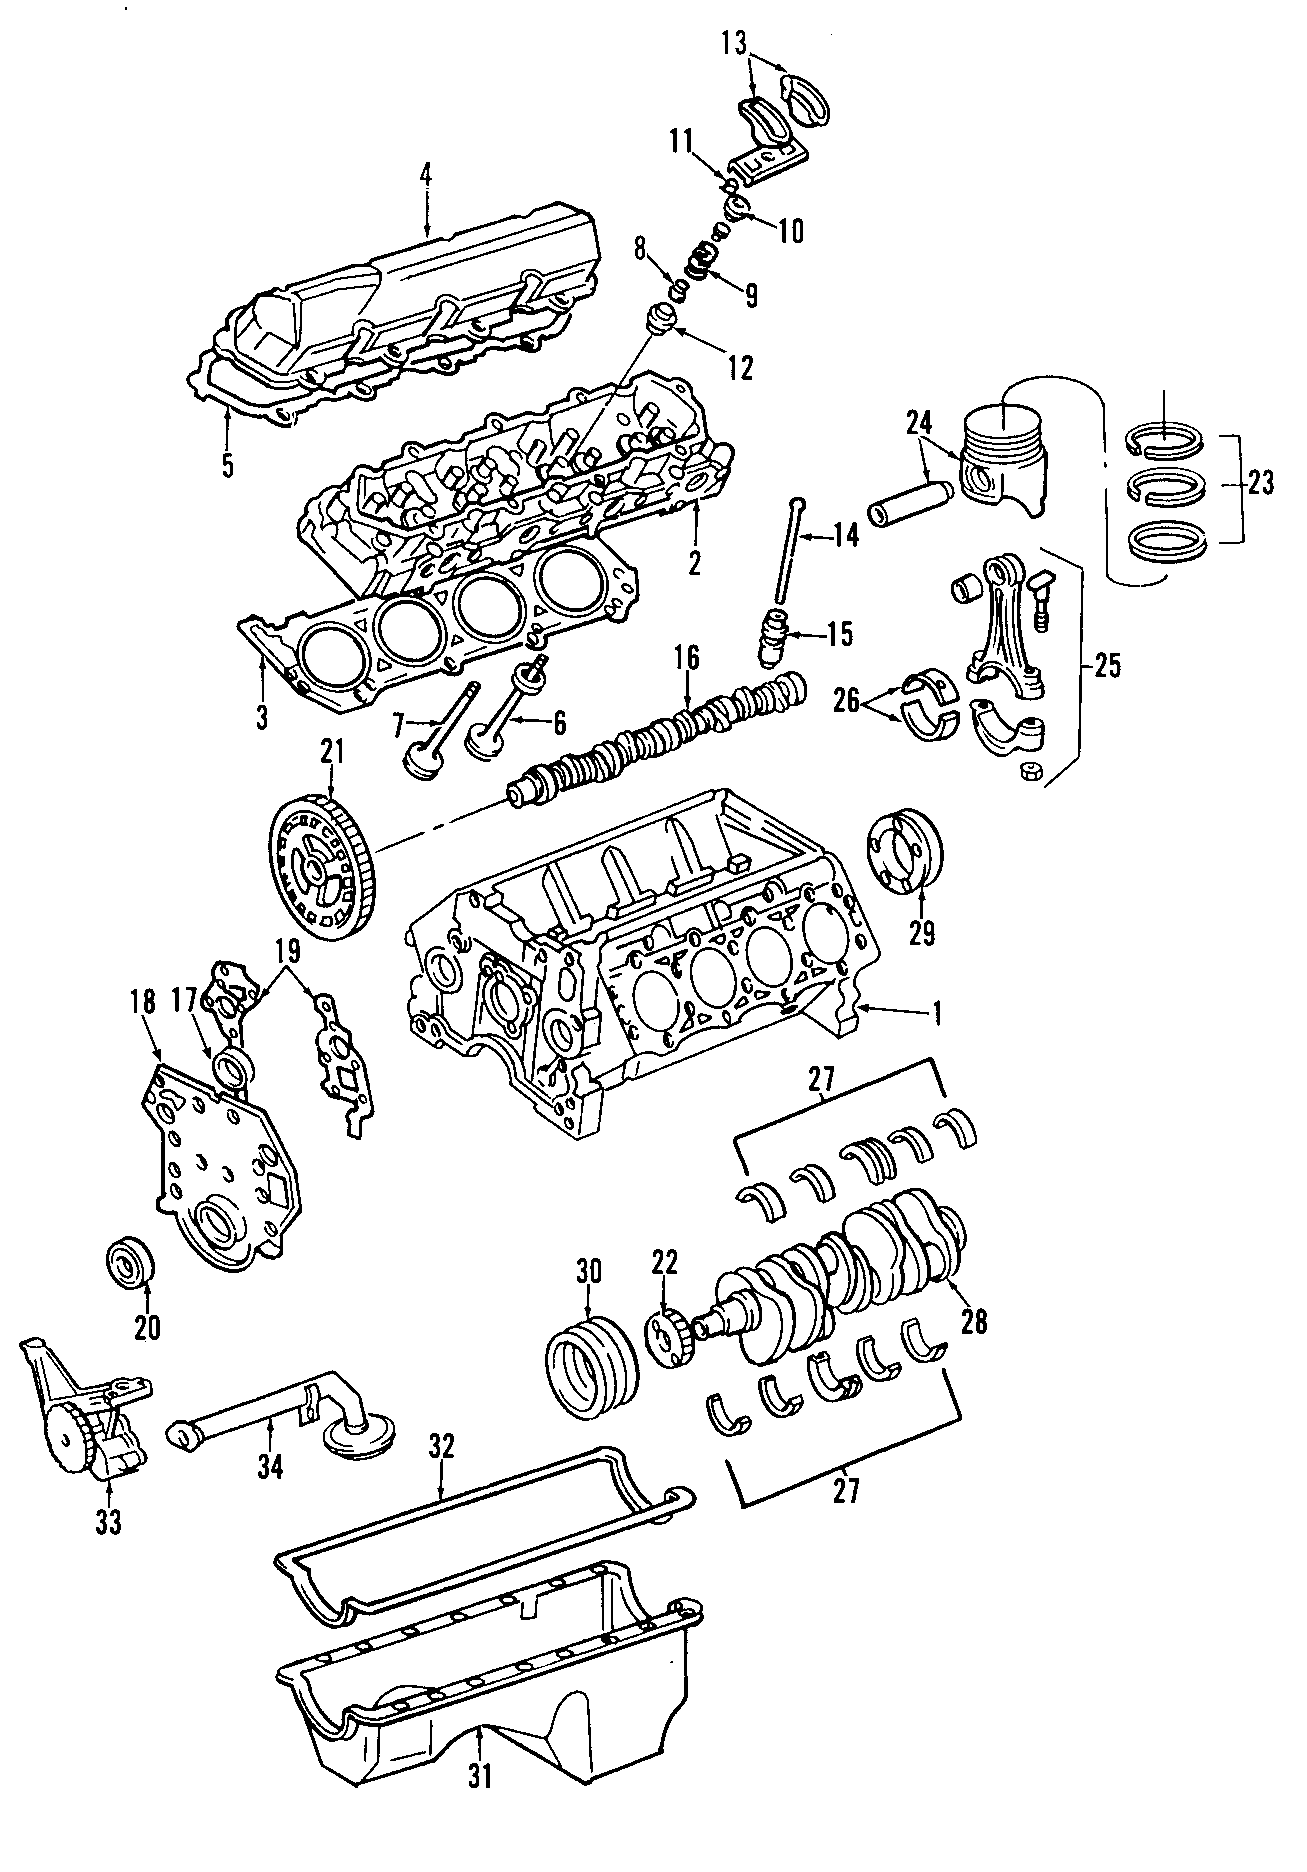 Ford F 250 Super Duty Engine Valve Cover Gasket